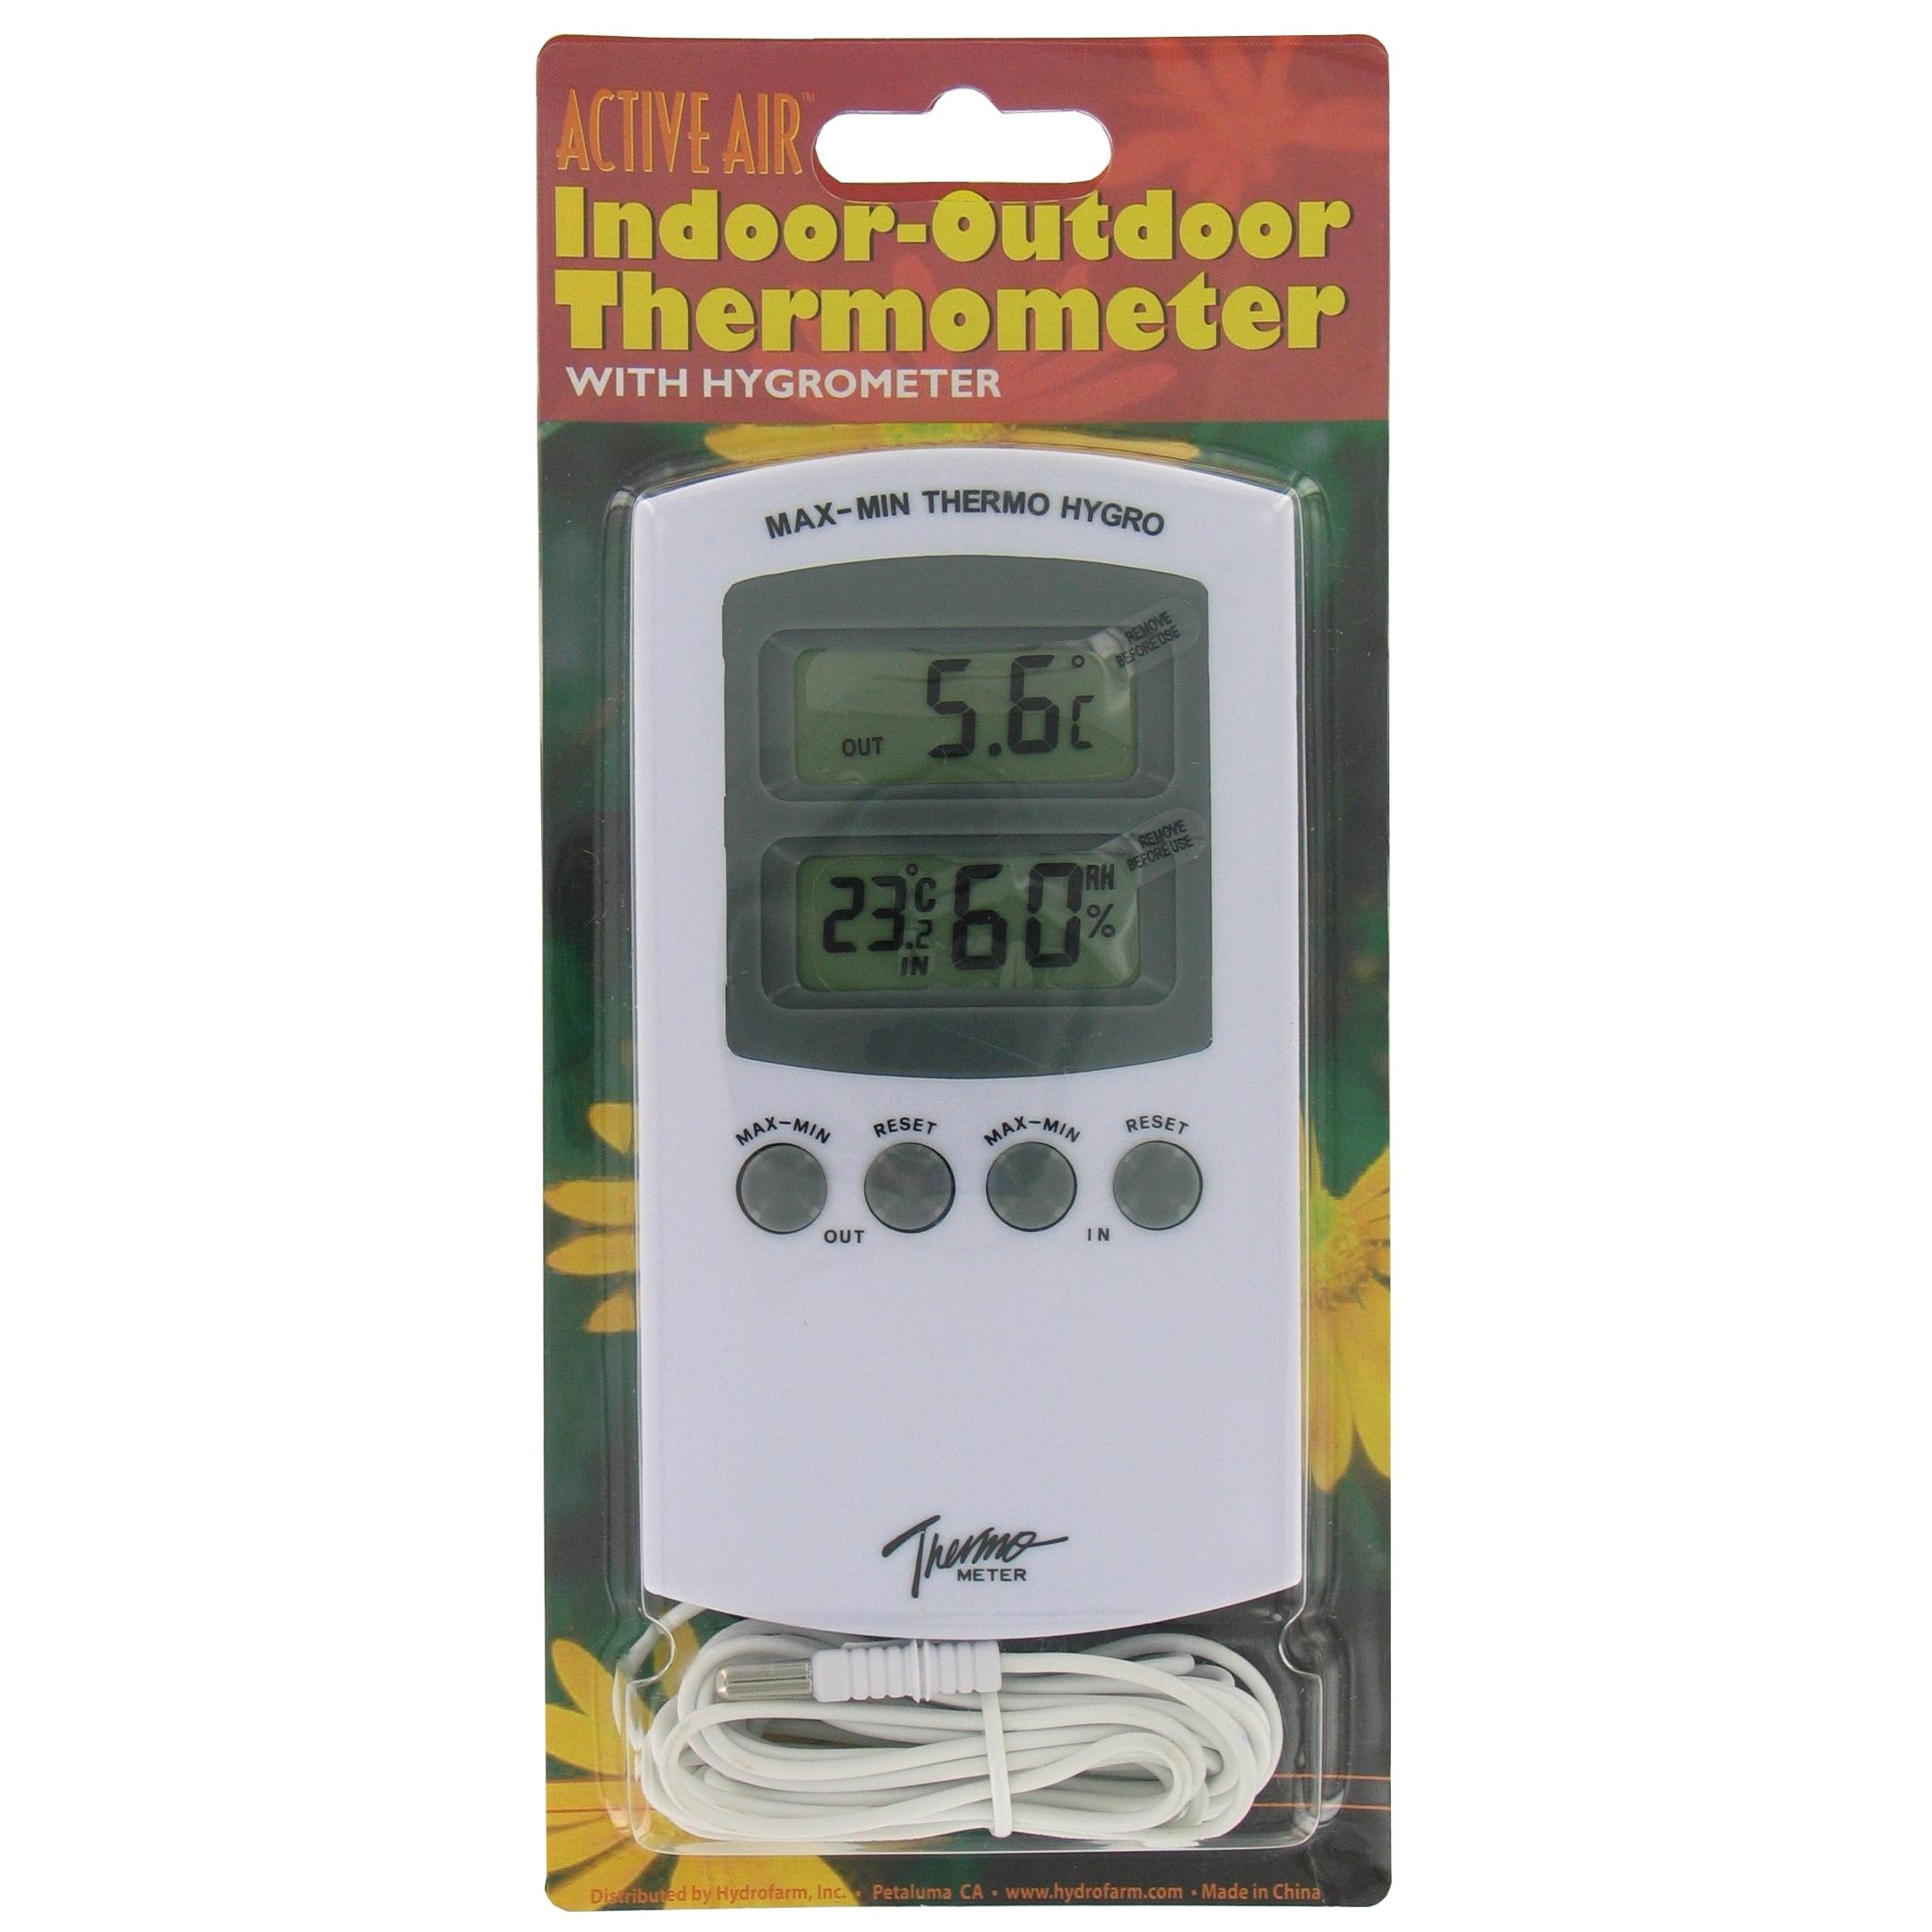 Hydrofarm Hgioht ActiveAir Indoor Outdoor Thermometer Wit...